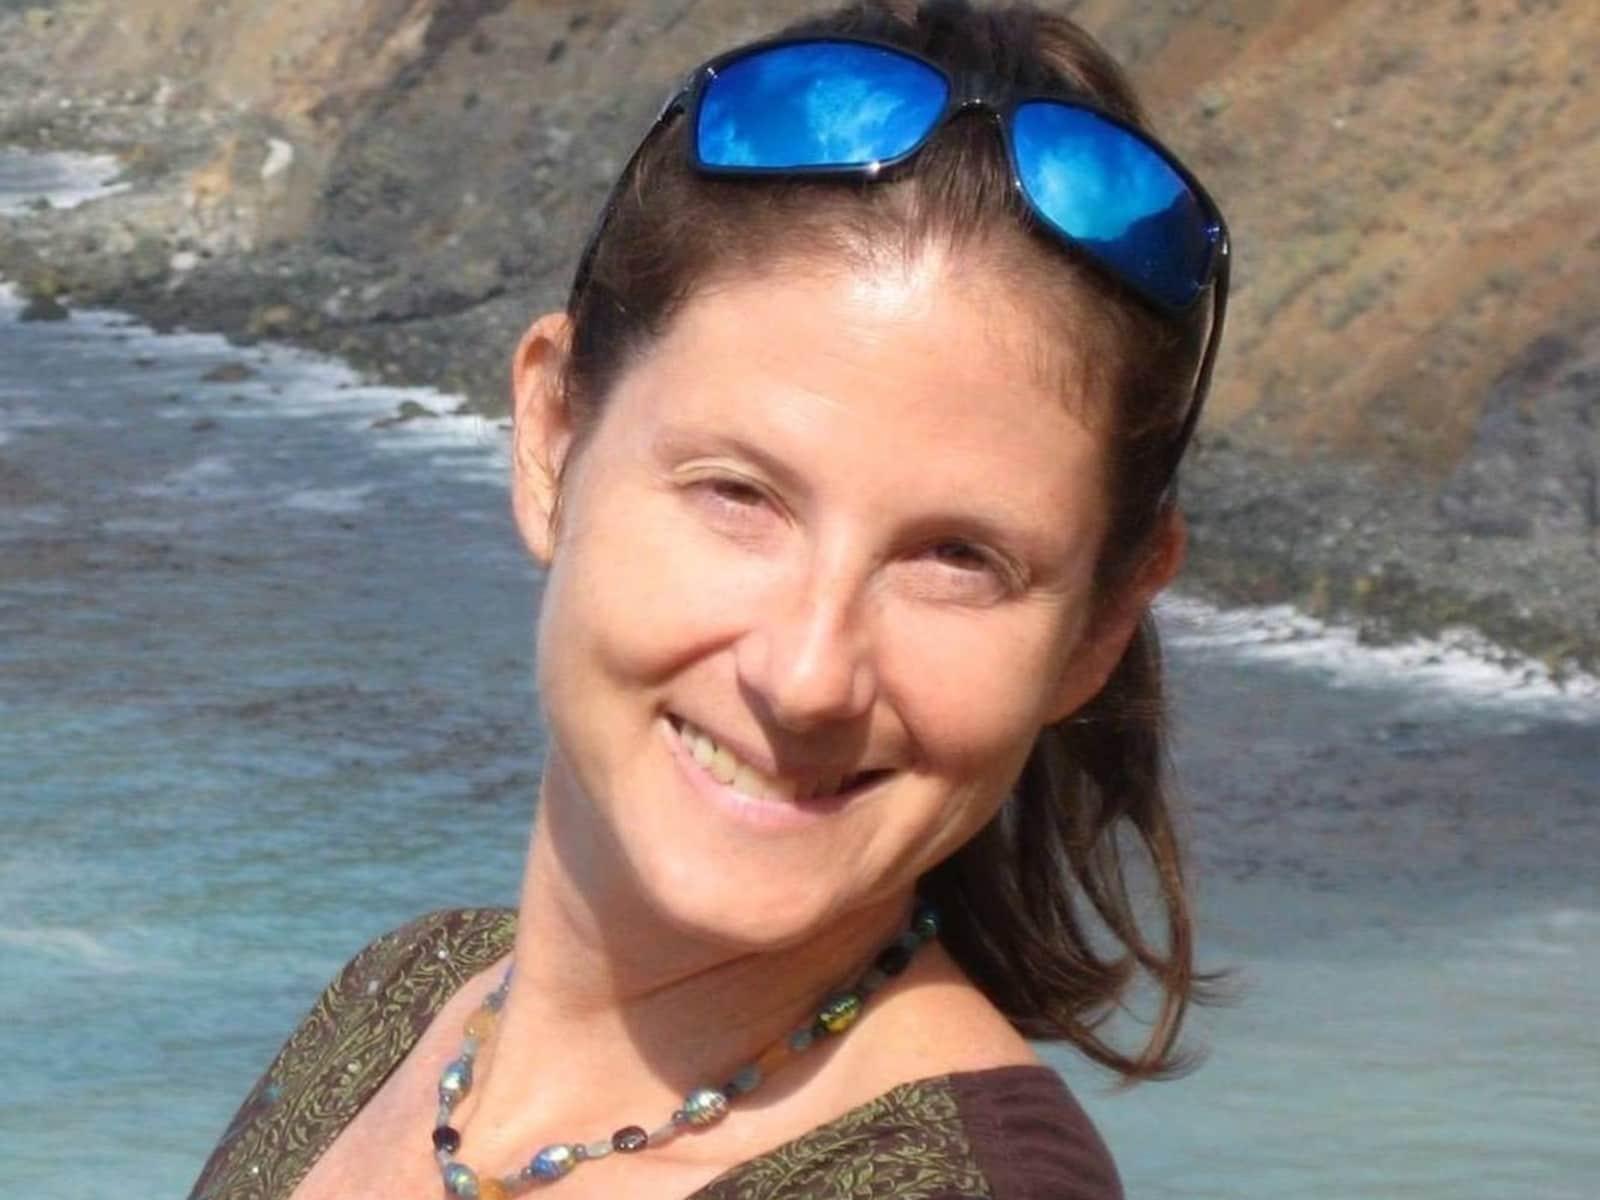 Debra from Santa Fe, New Mexico, United States